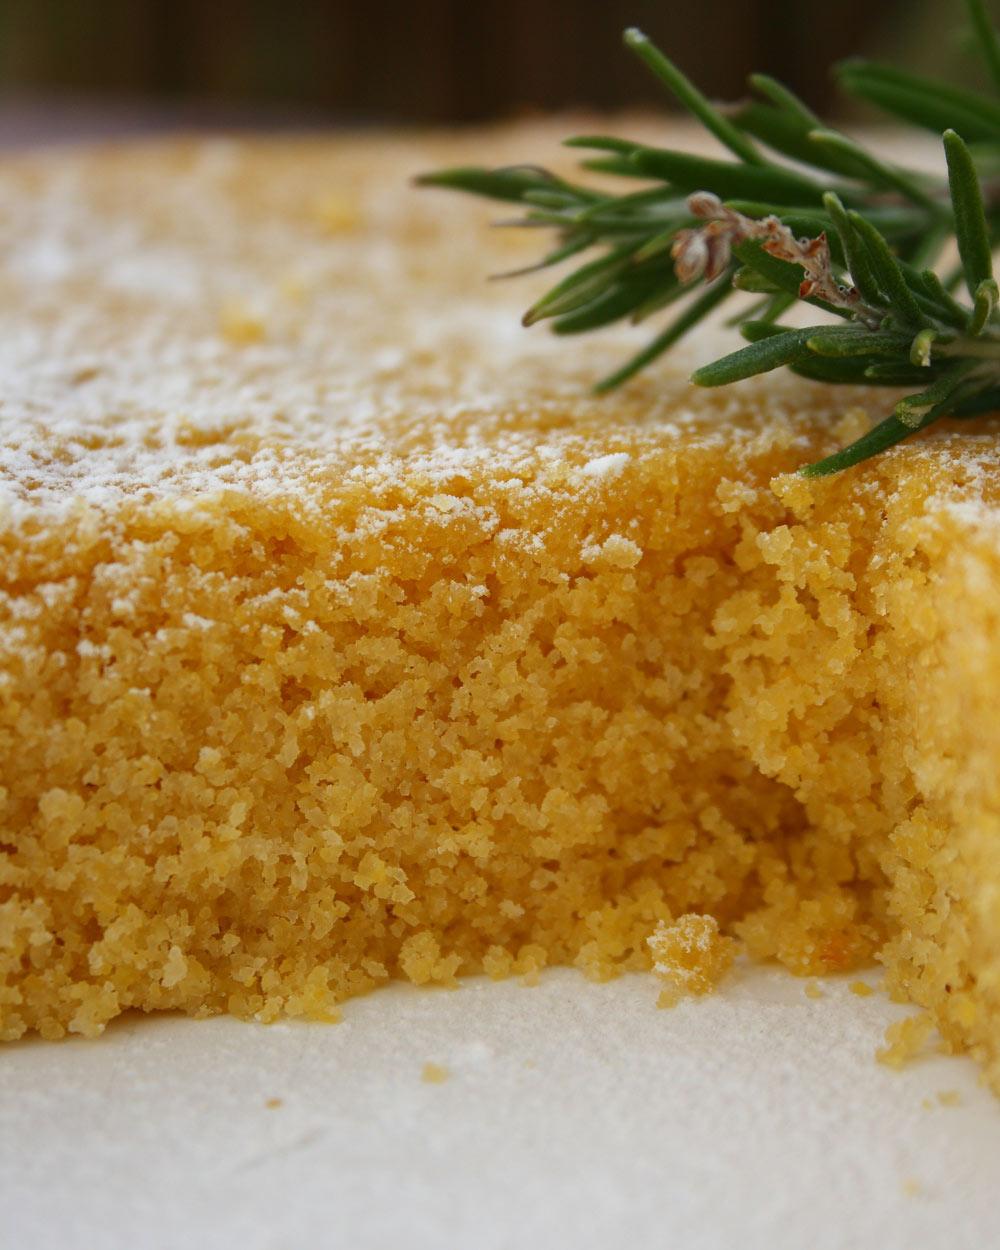 lemon polenta cake lemon polenta and almond cake gluten free polenta ...